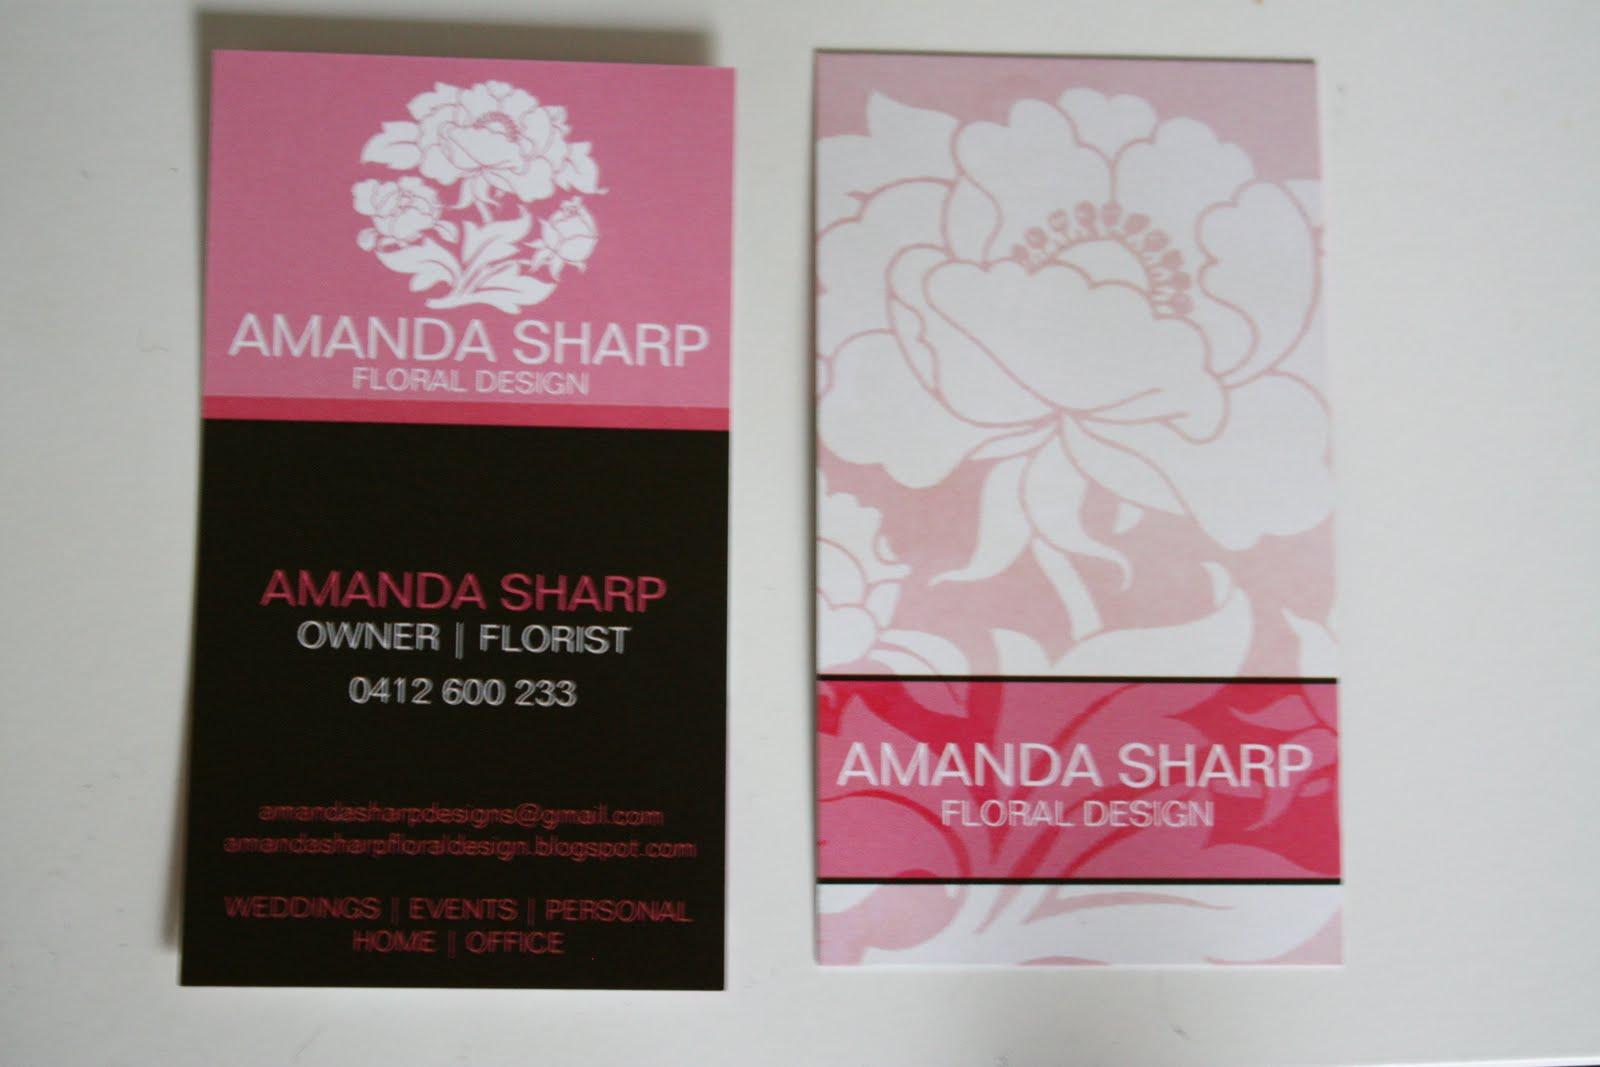 Amanda Sharp Floral Design: Business Cards!